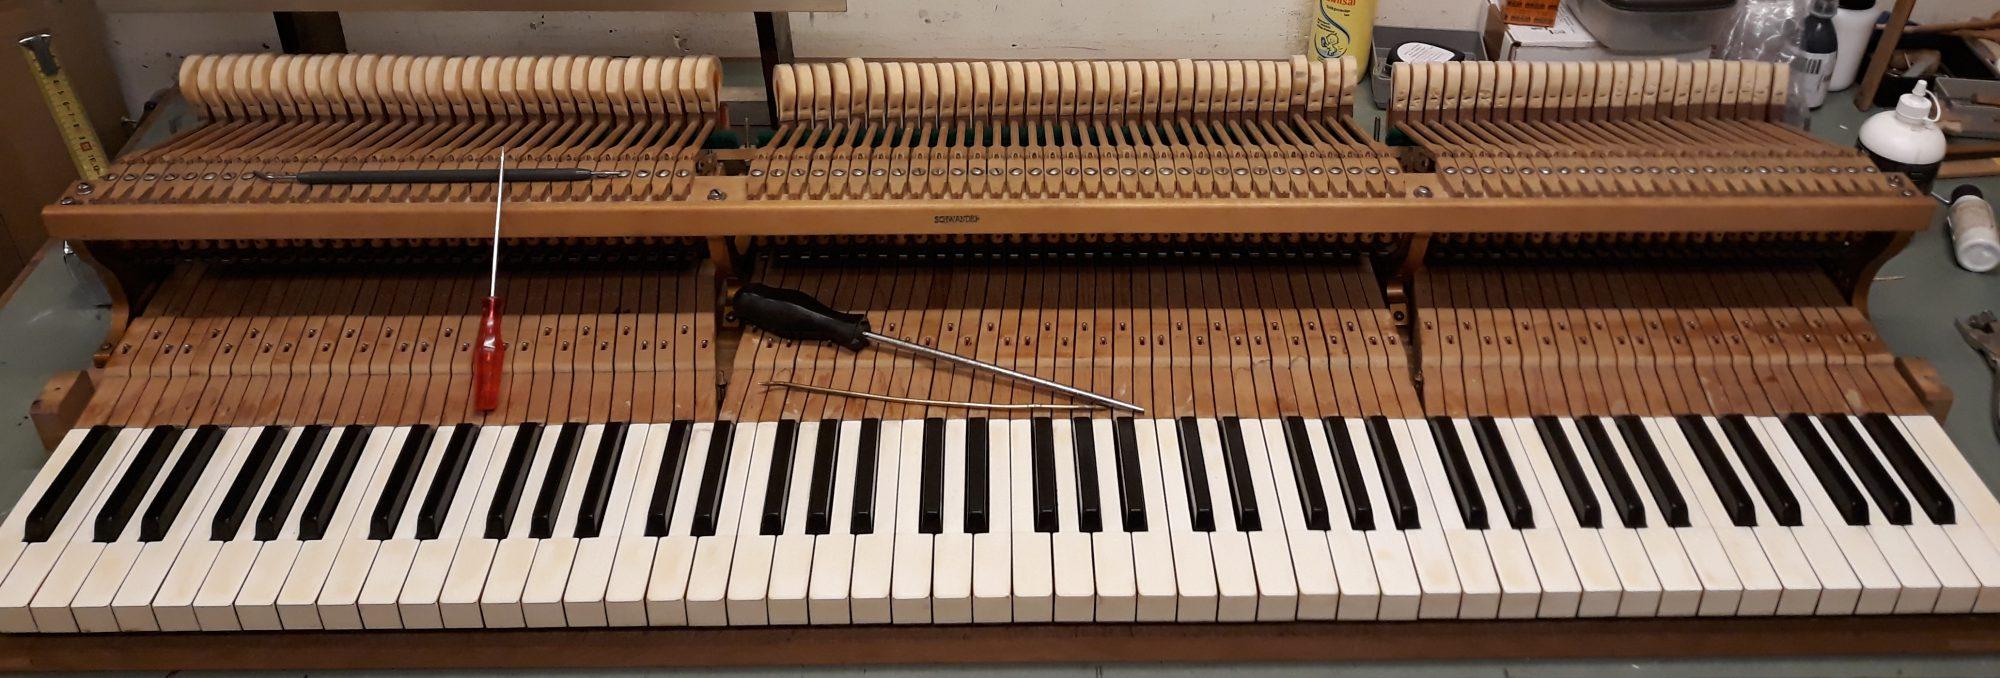 Pianissimo / Coenraad van Baalen